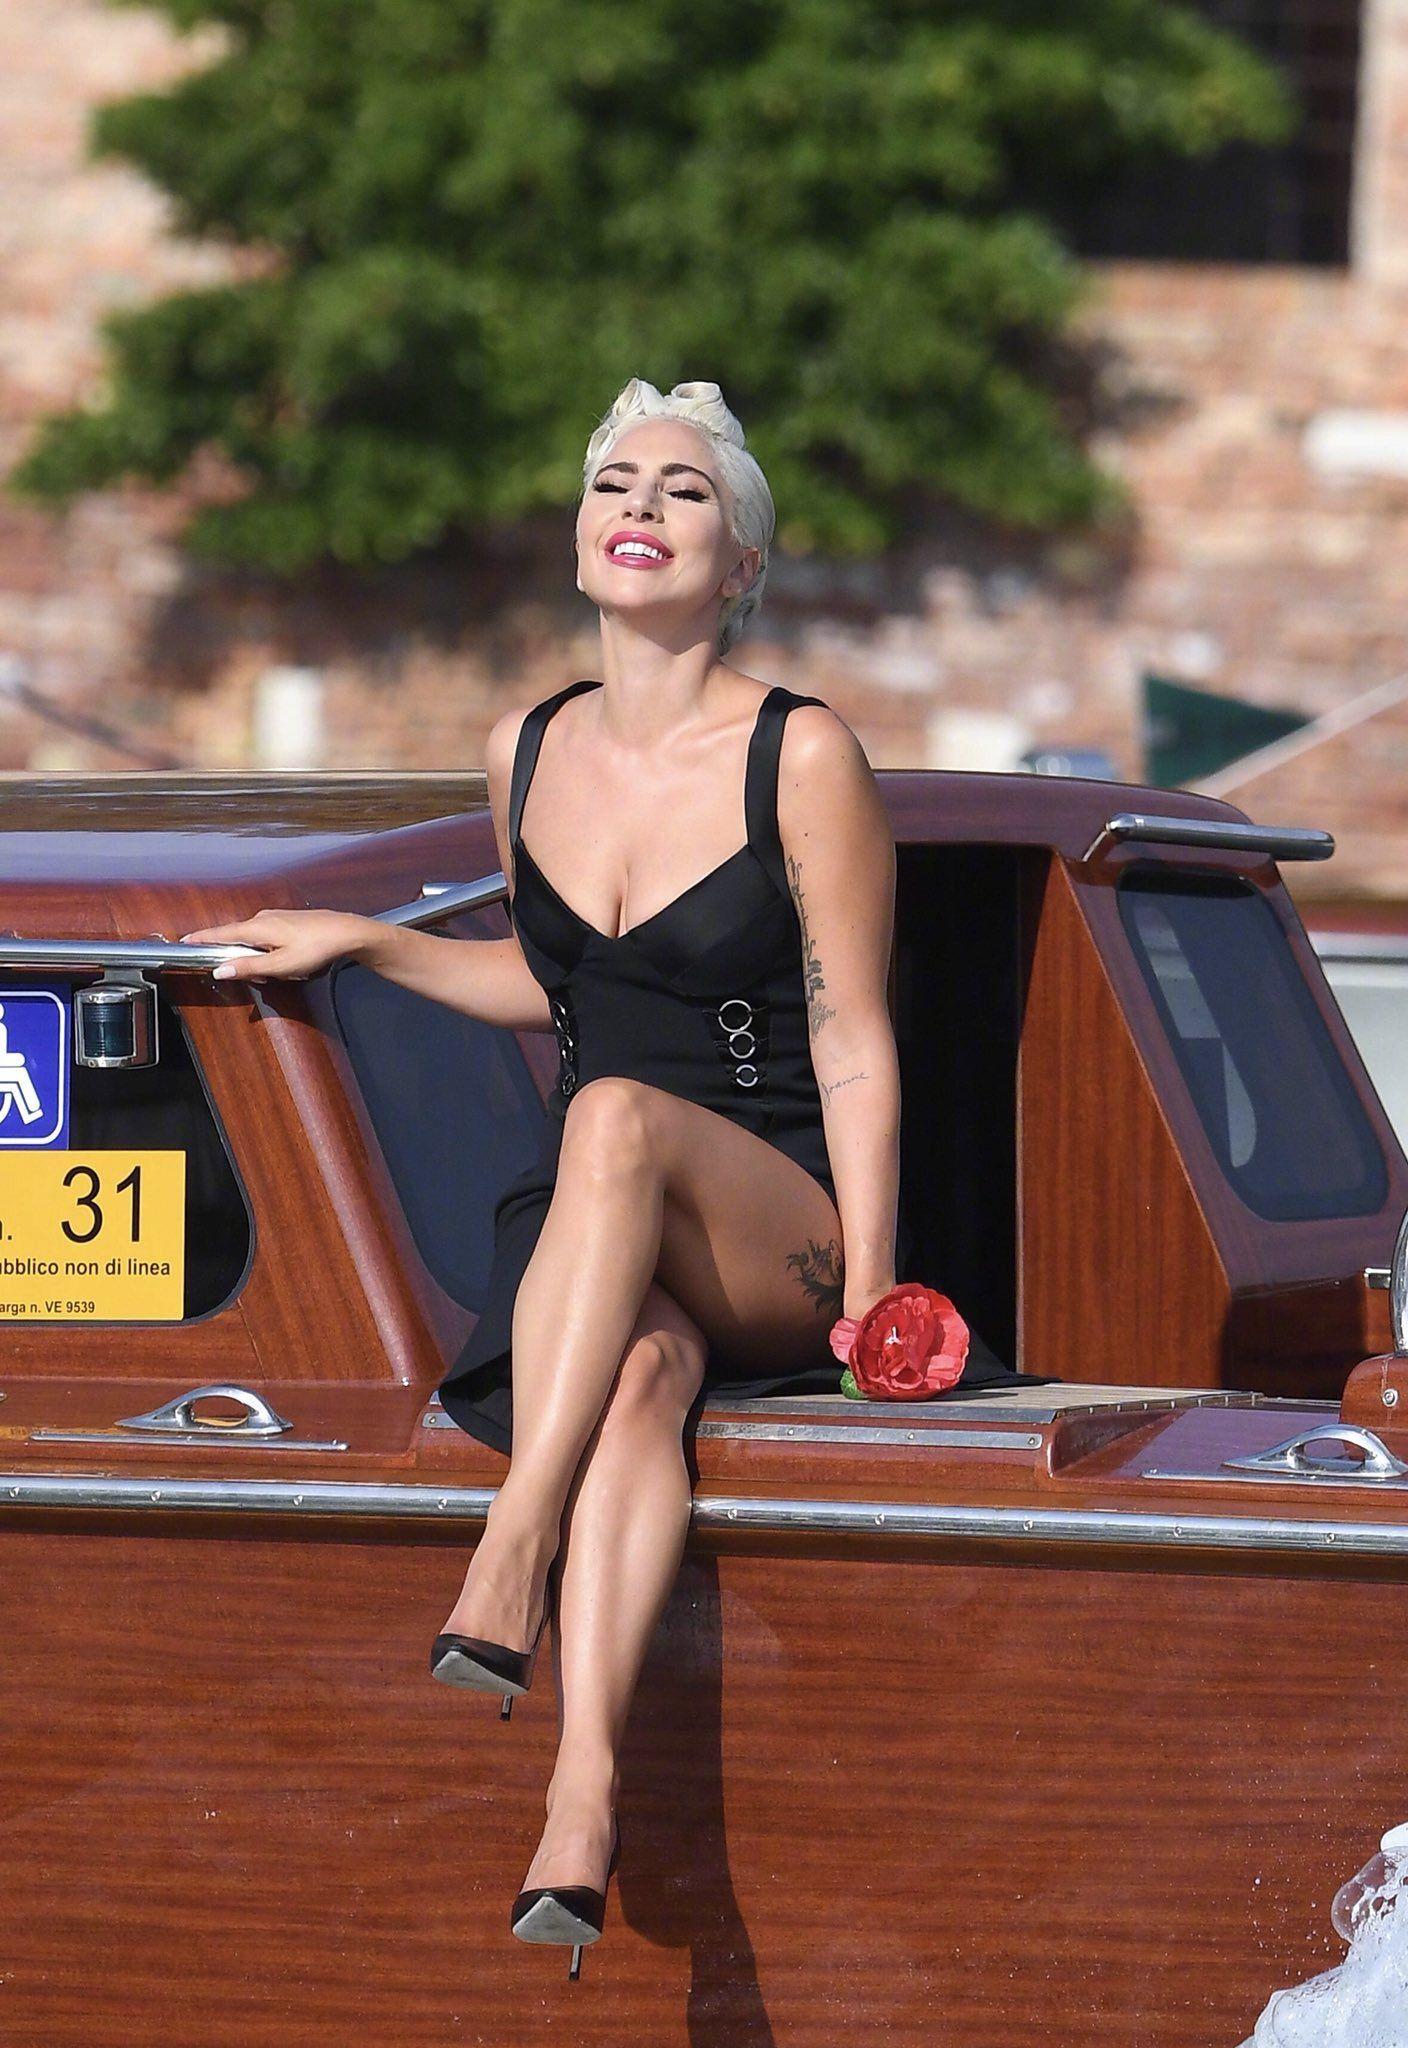 Lady Gaga hot pics. 2018-2019 celebrityes photos leaks! nude (51 photo), Is a cute Celebrites foto